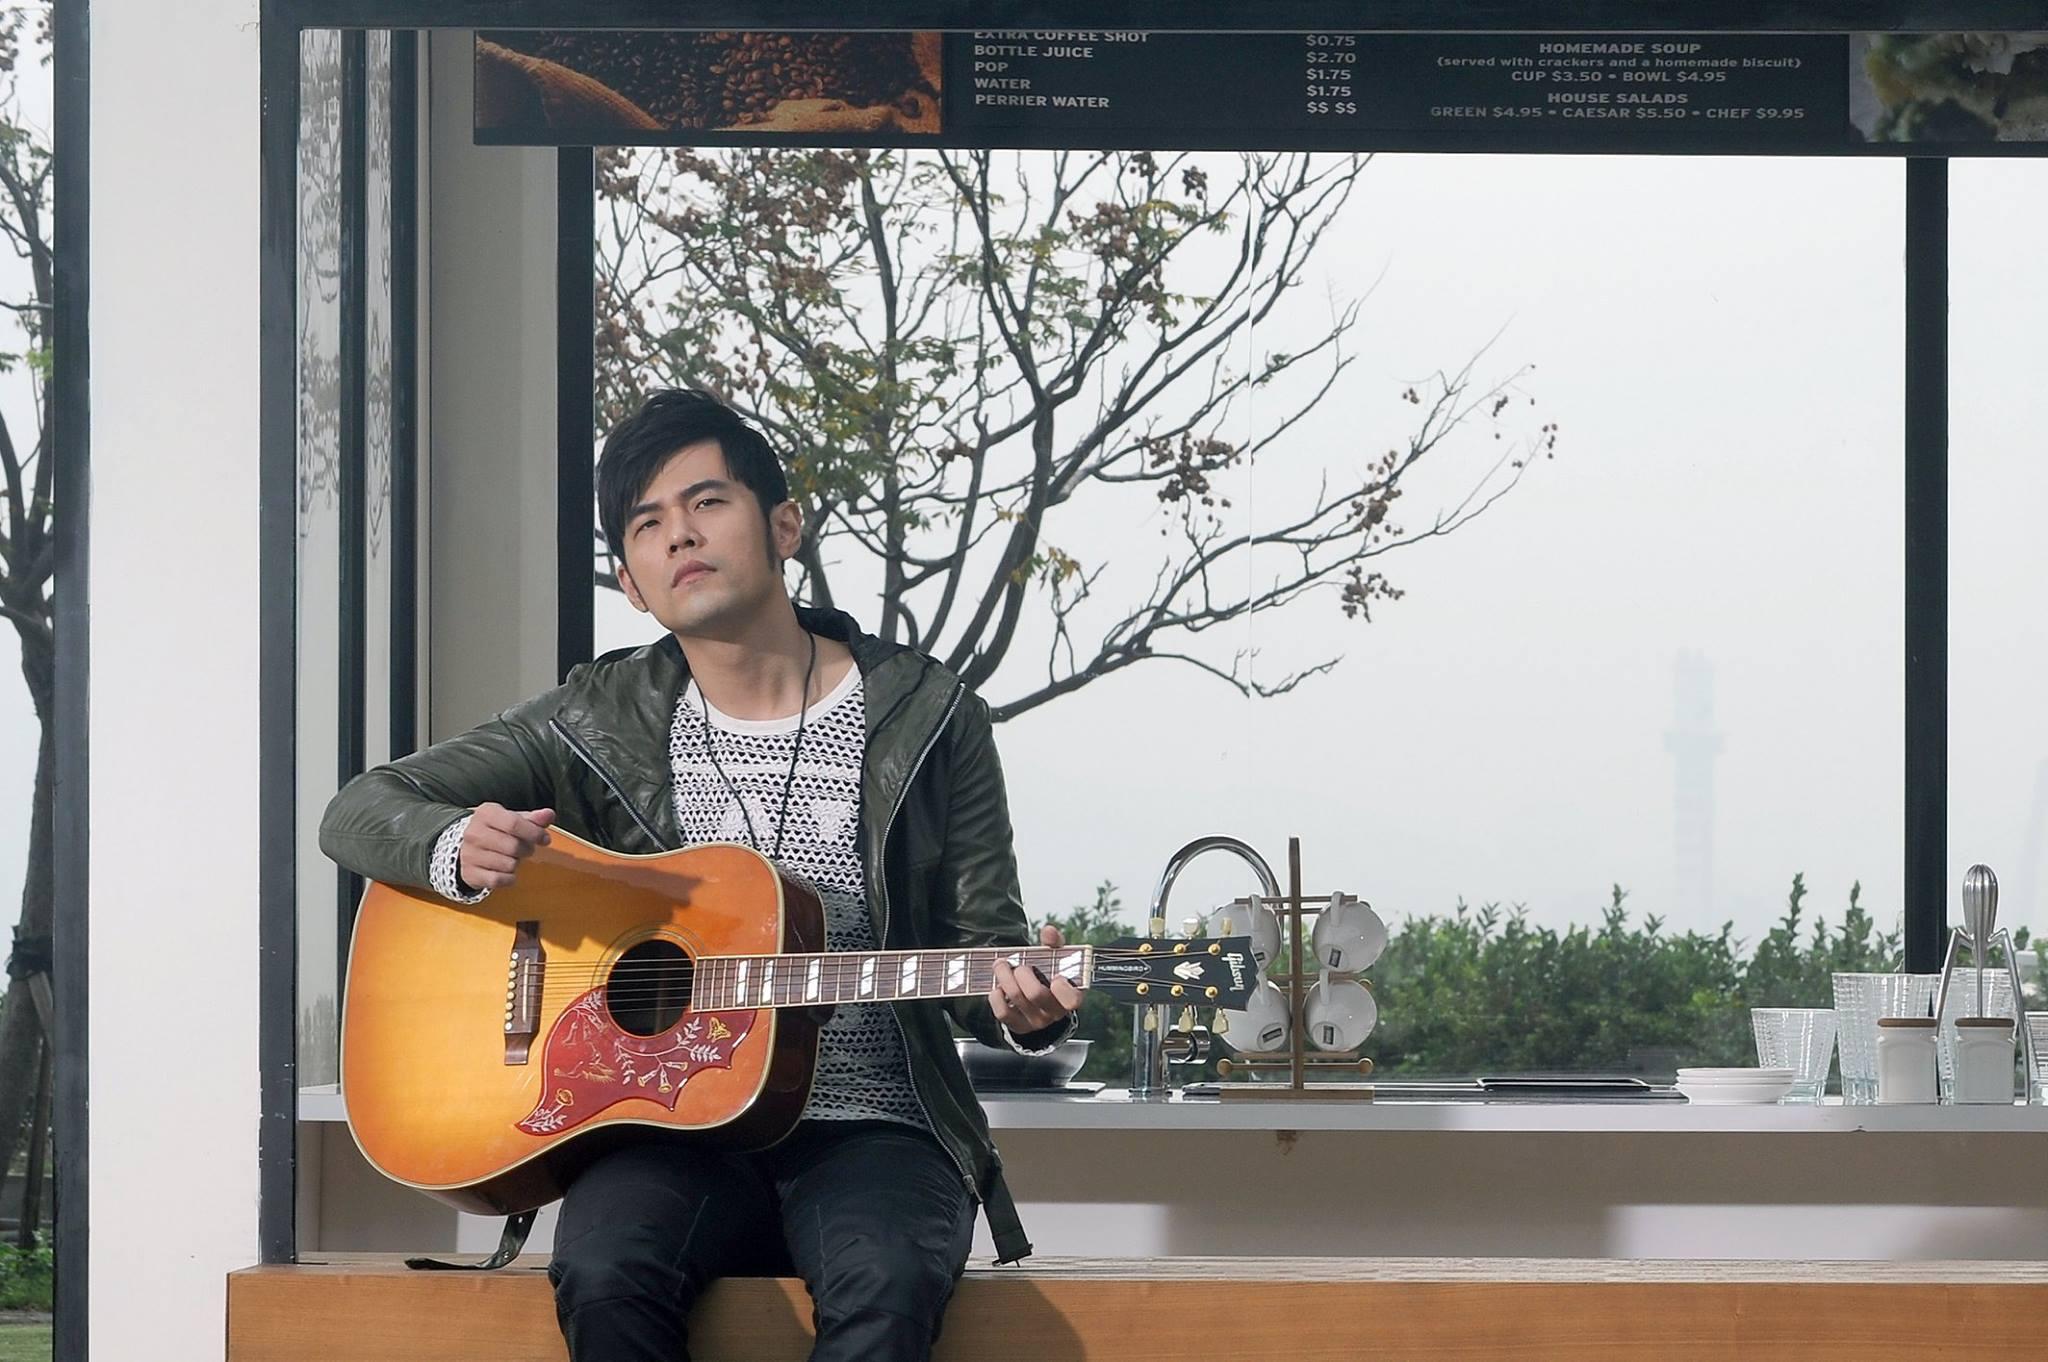 Jay Chou Wallpapers Hd